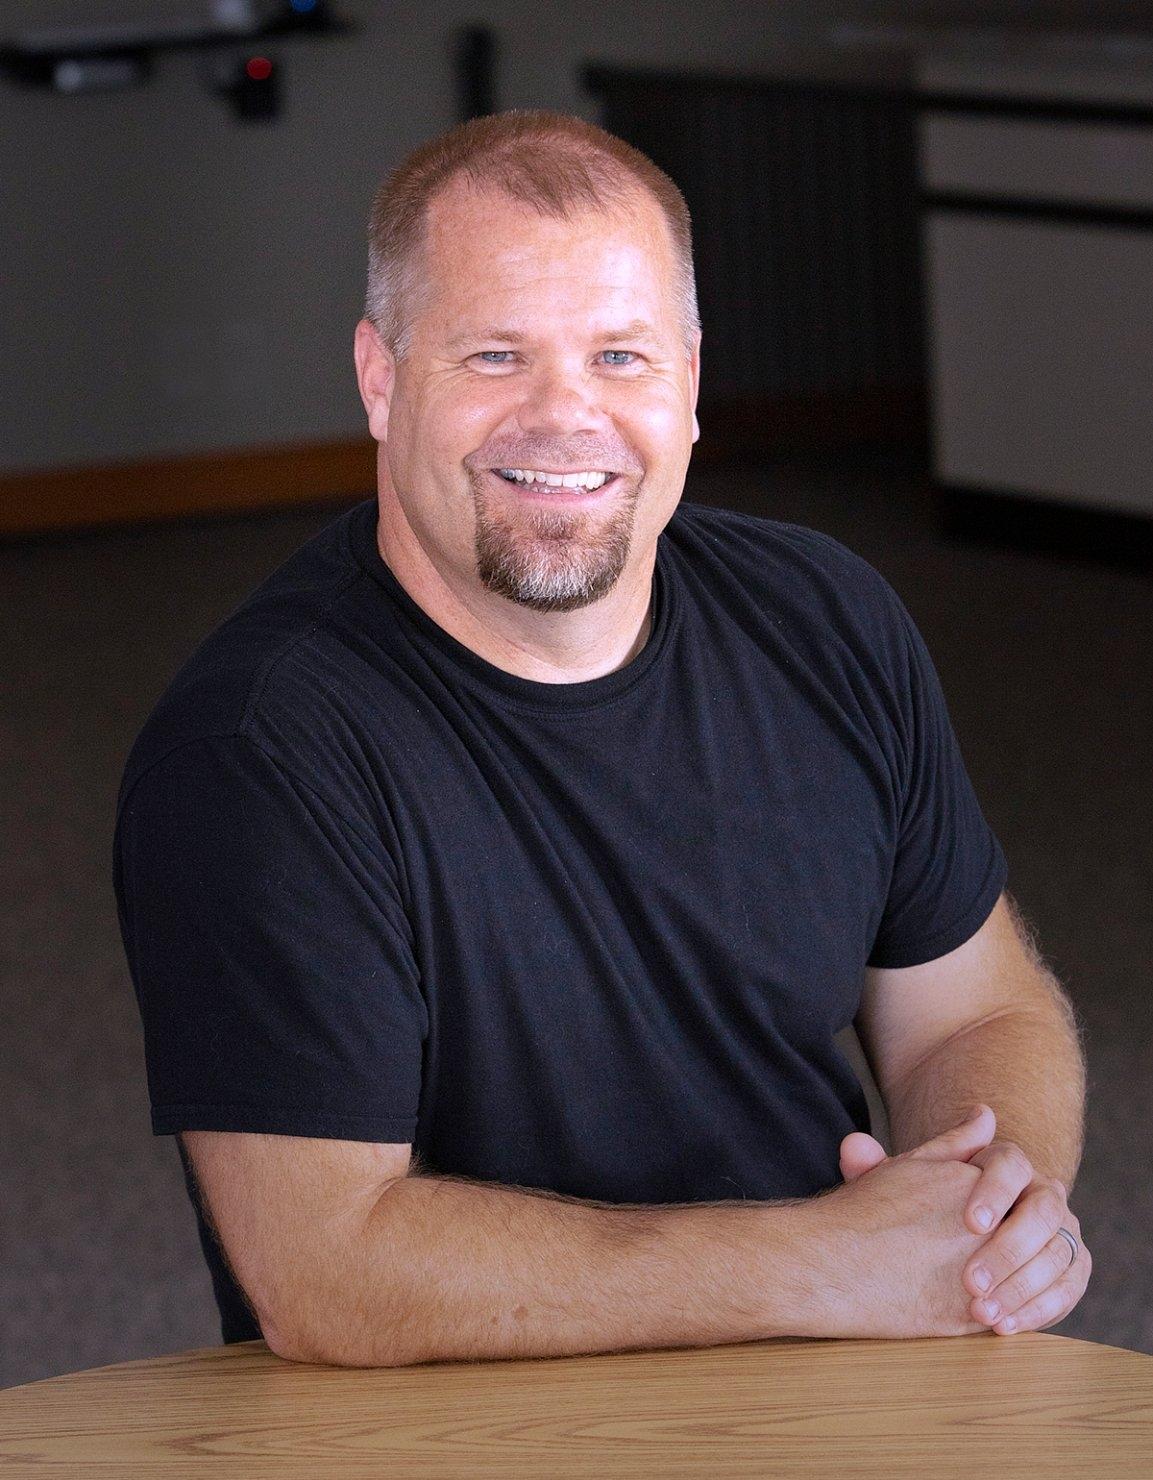 Matt Yaley  |  Danville Youth Pastor    matt@harmonybiblechurch.org